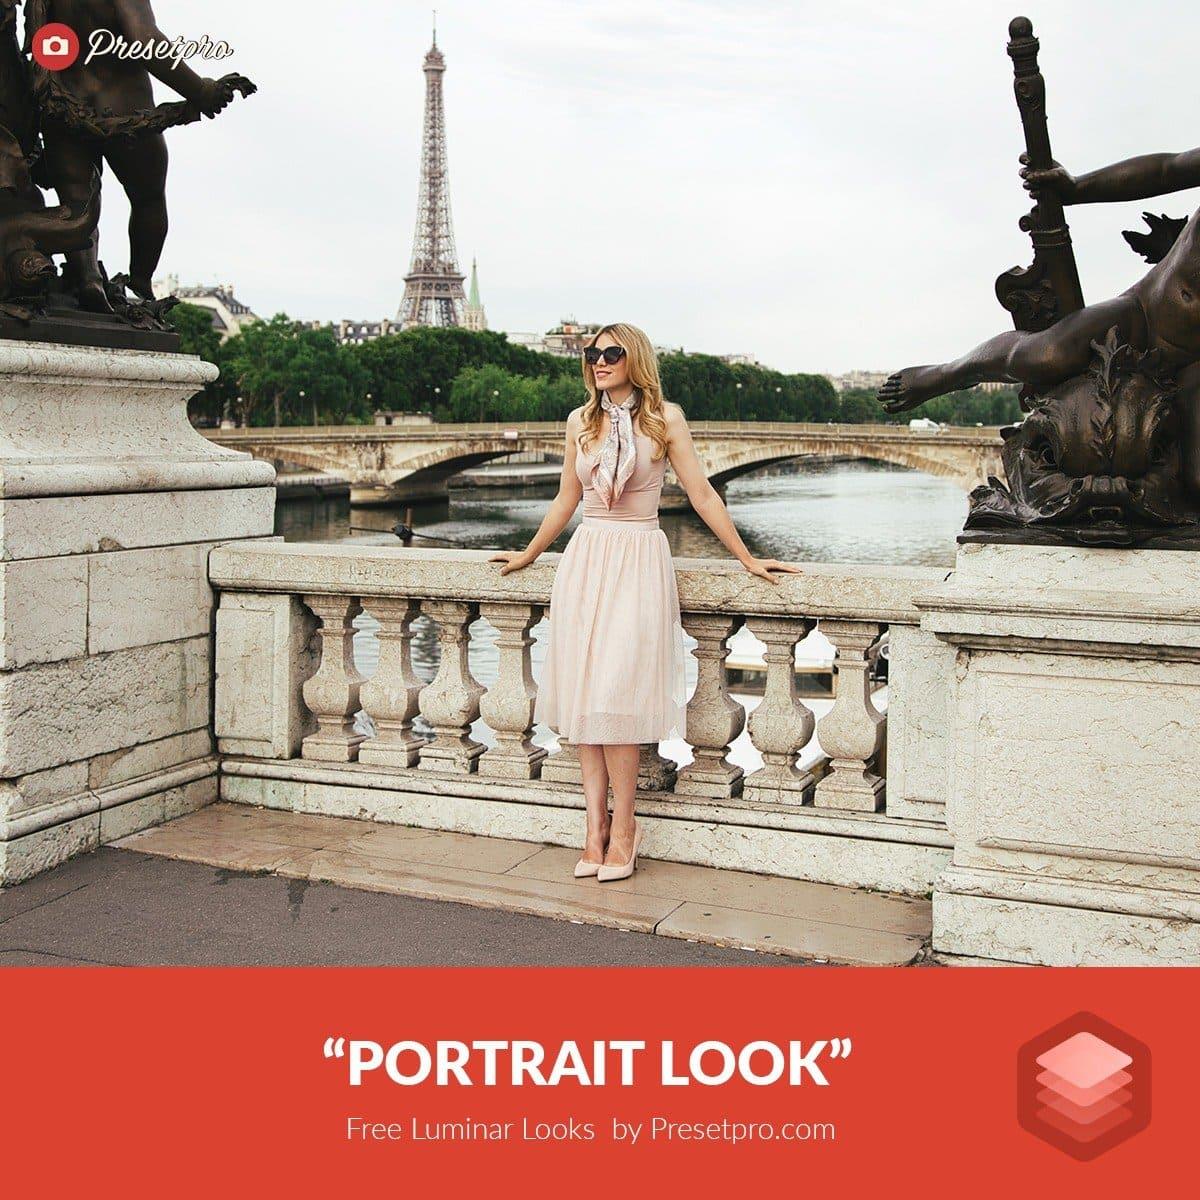 Free-Luminar-Look-Film-Portrait-Preset-Presetpro.com